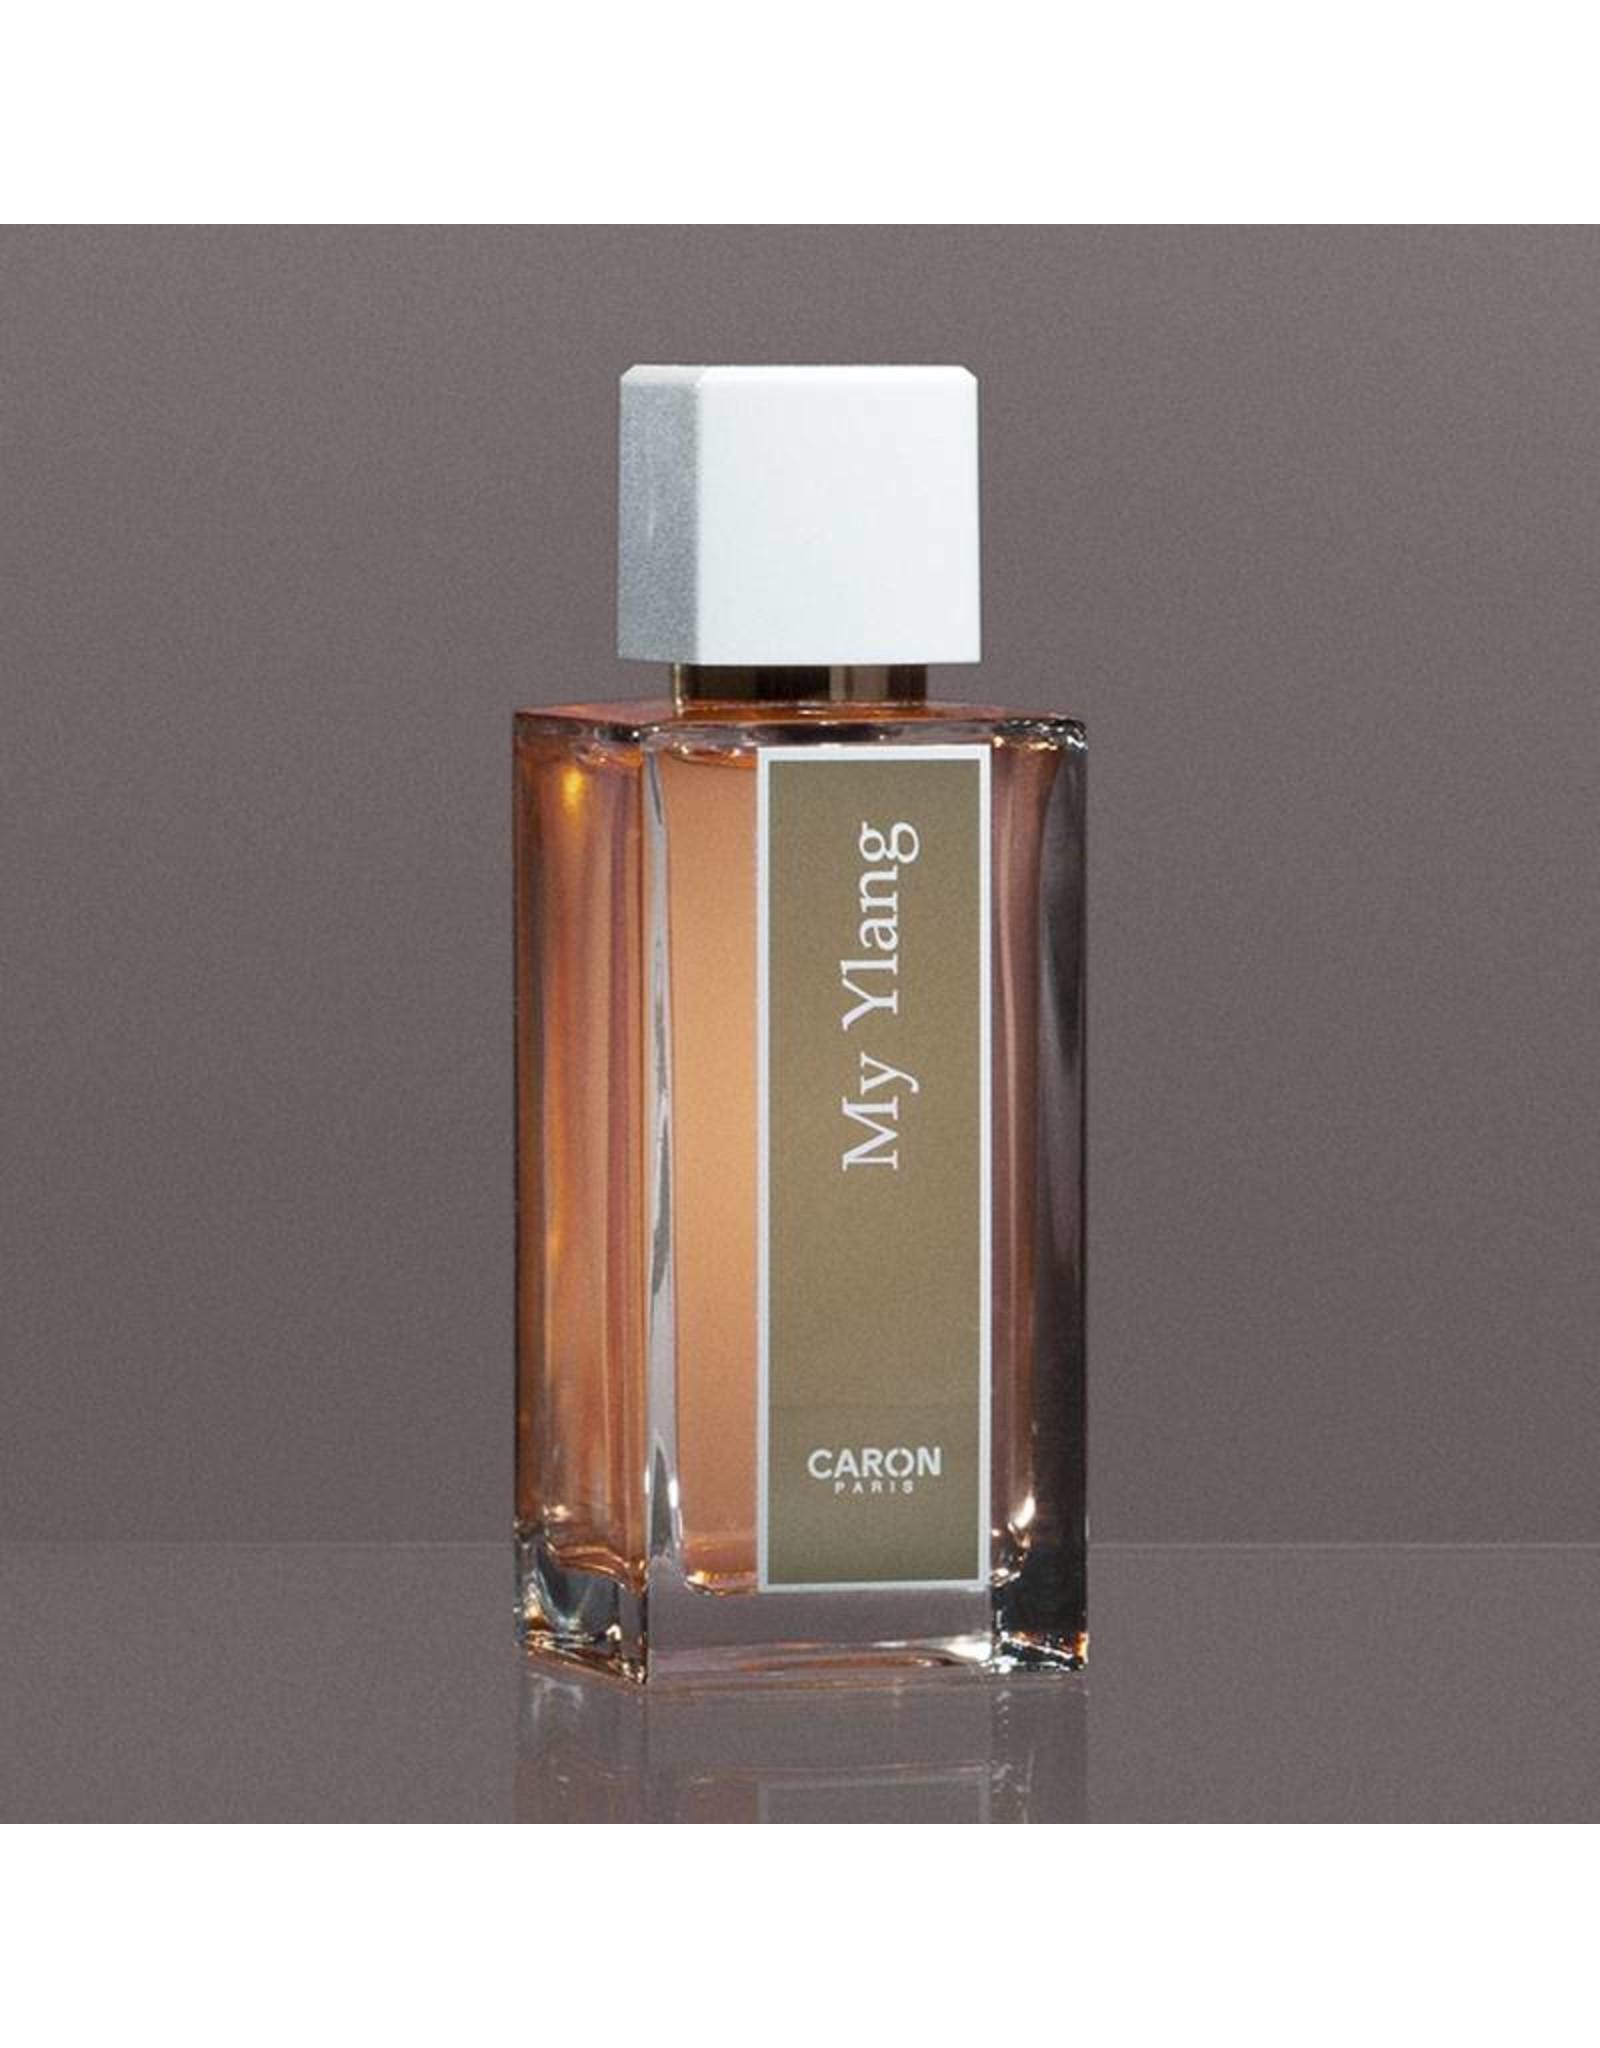 Caron Paris La Selection - My Ylang